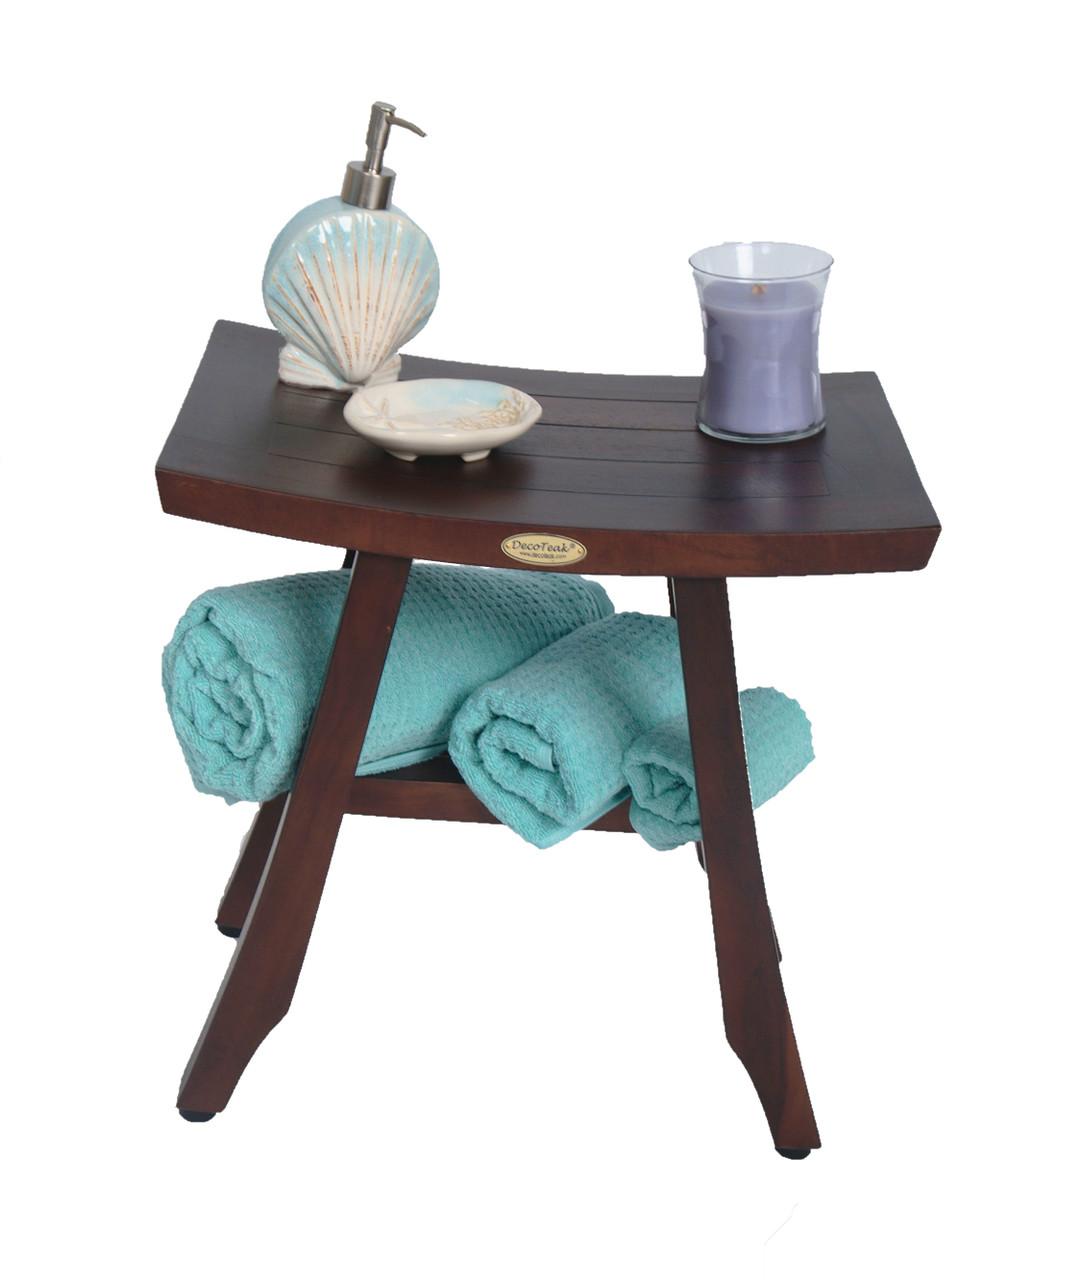 "DecoTeak Satori 18"" Teak Wood Shower Bench in Woodland Brown Finish"